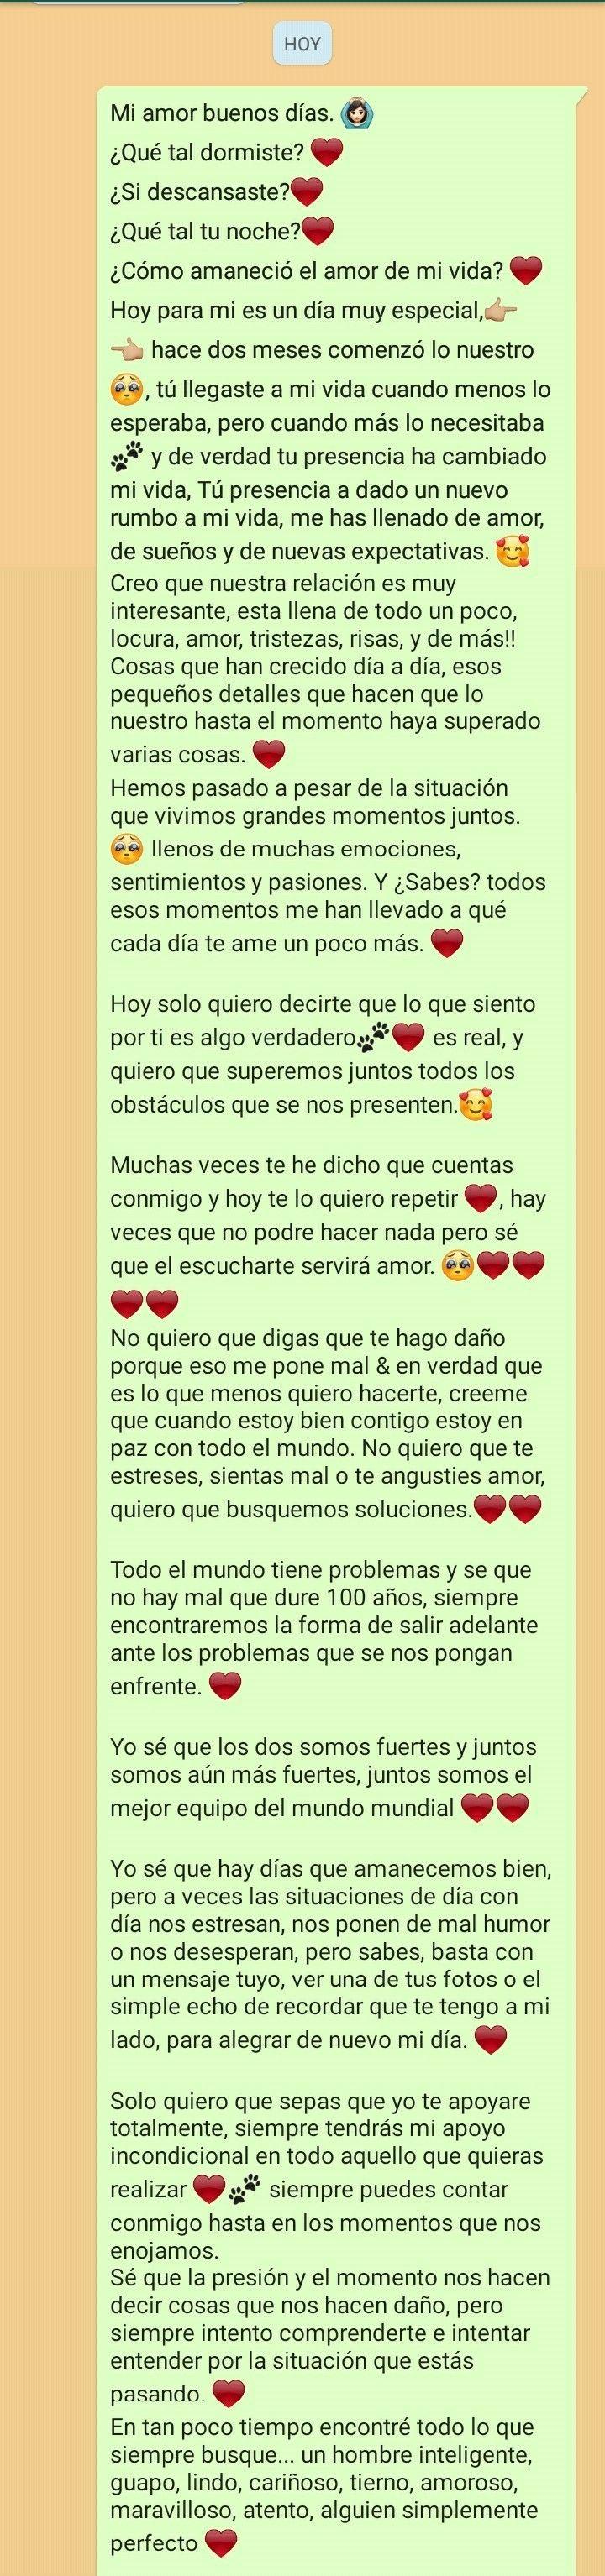 2 Meses Mensajes De Texto Bonitos Mensajes De Texto De Amor Palabras Para Mi Novio